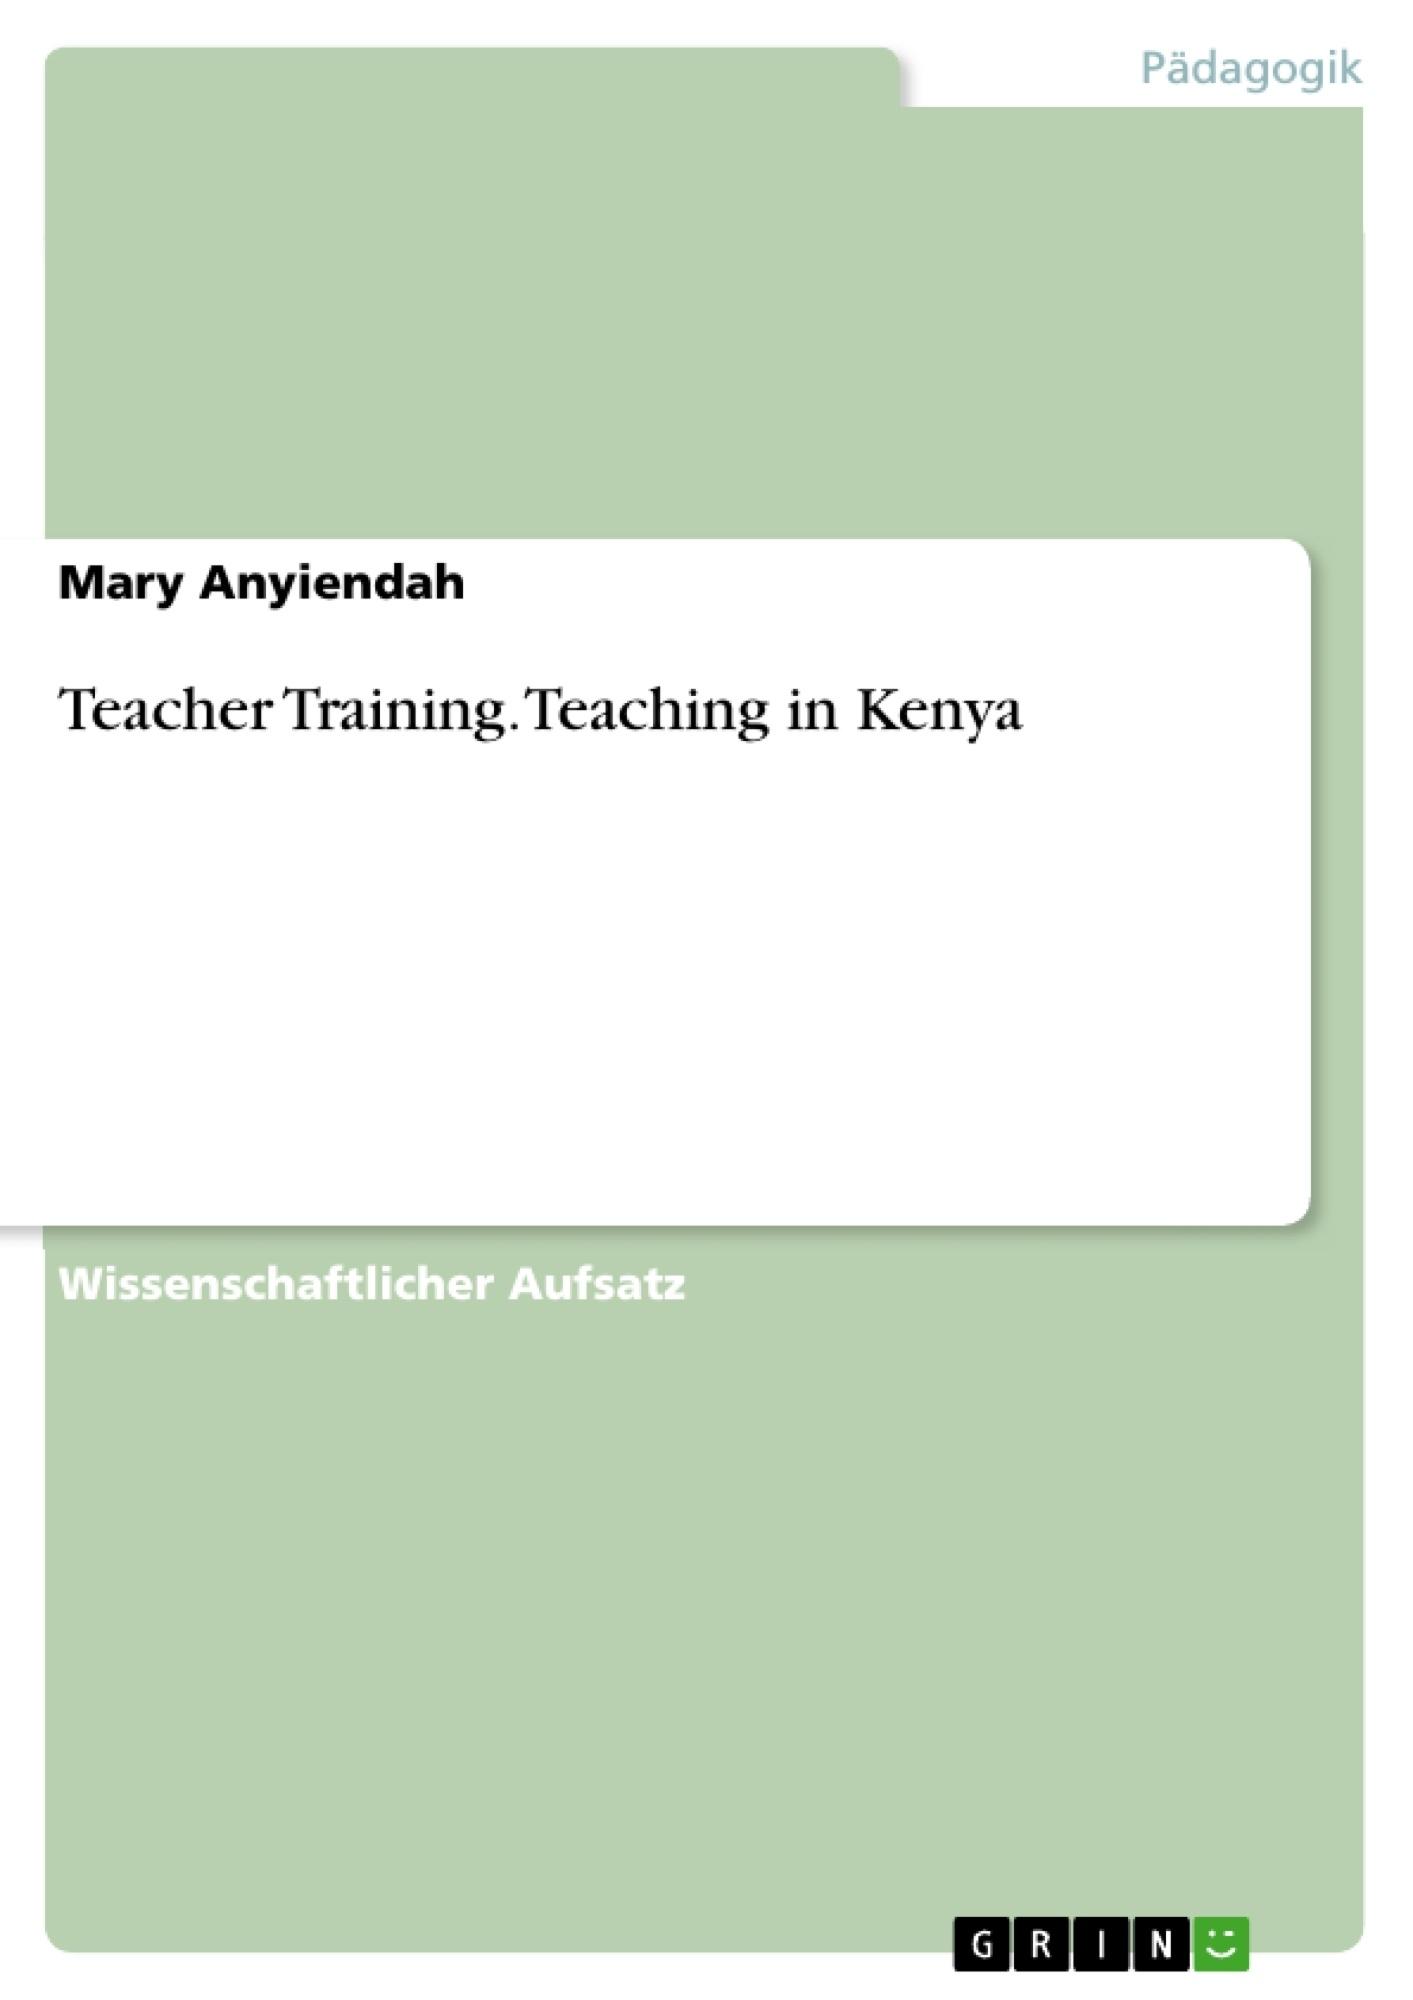 Titel: Teacher Training. Teaching in Kenya